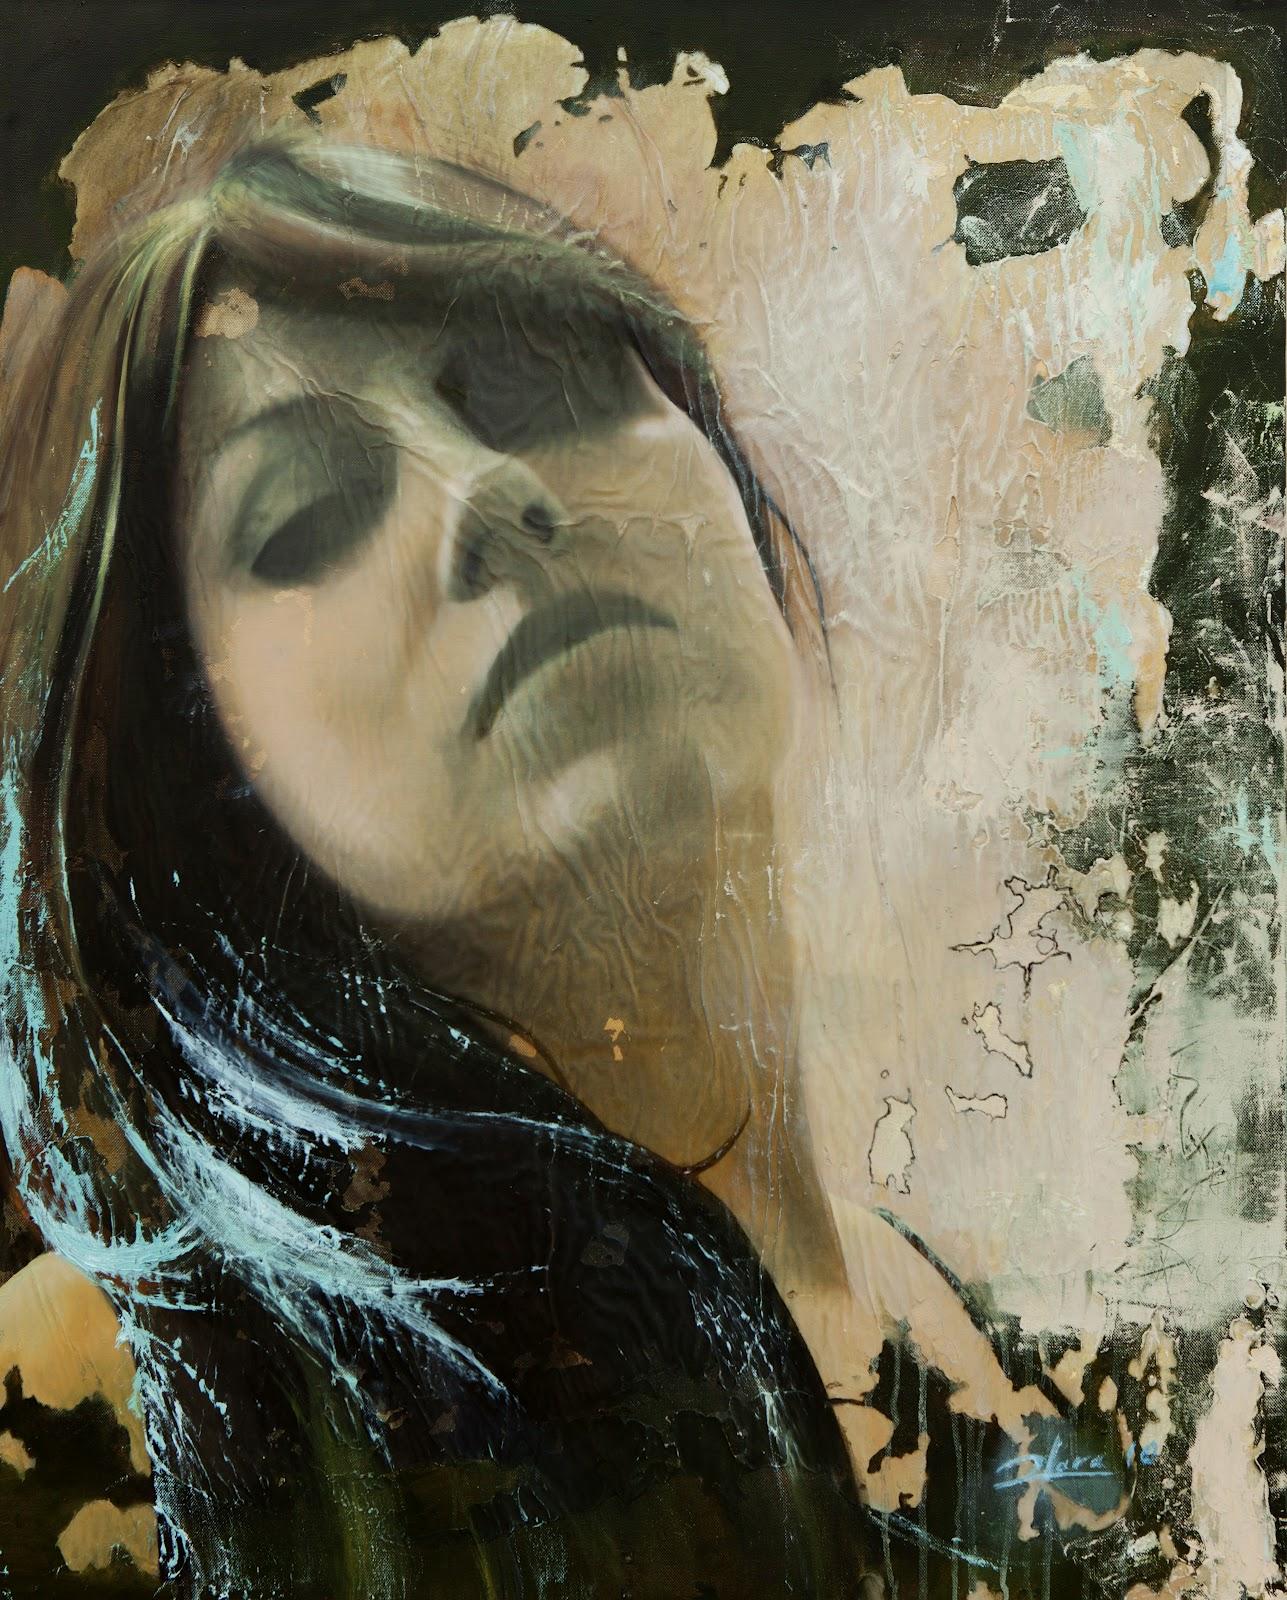 María. Técnica mixta al óleo sobre lienzo. 100cm x 80cm